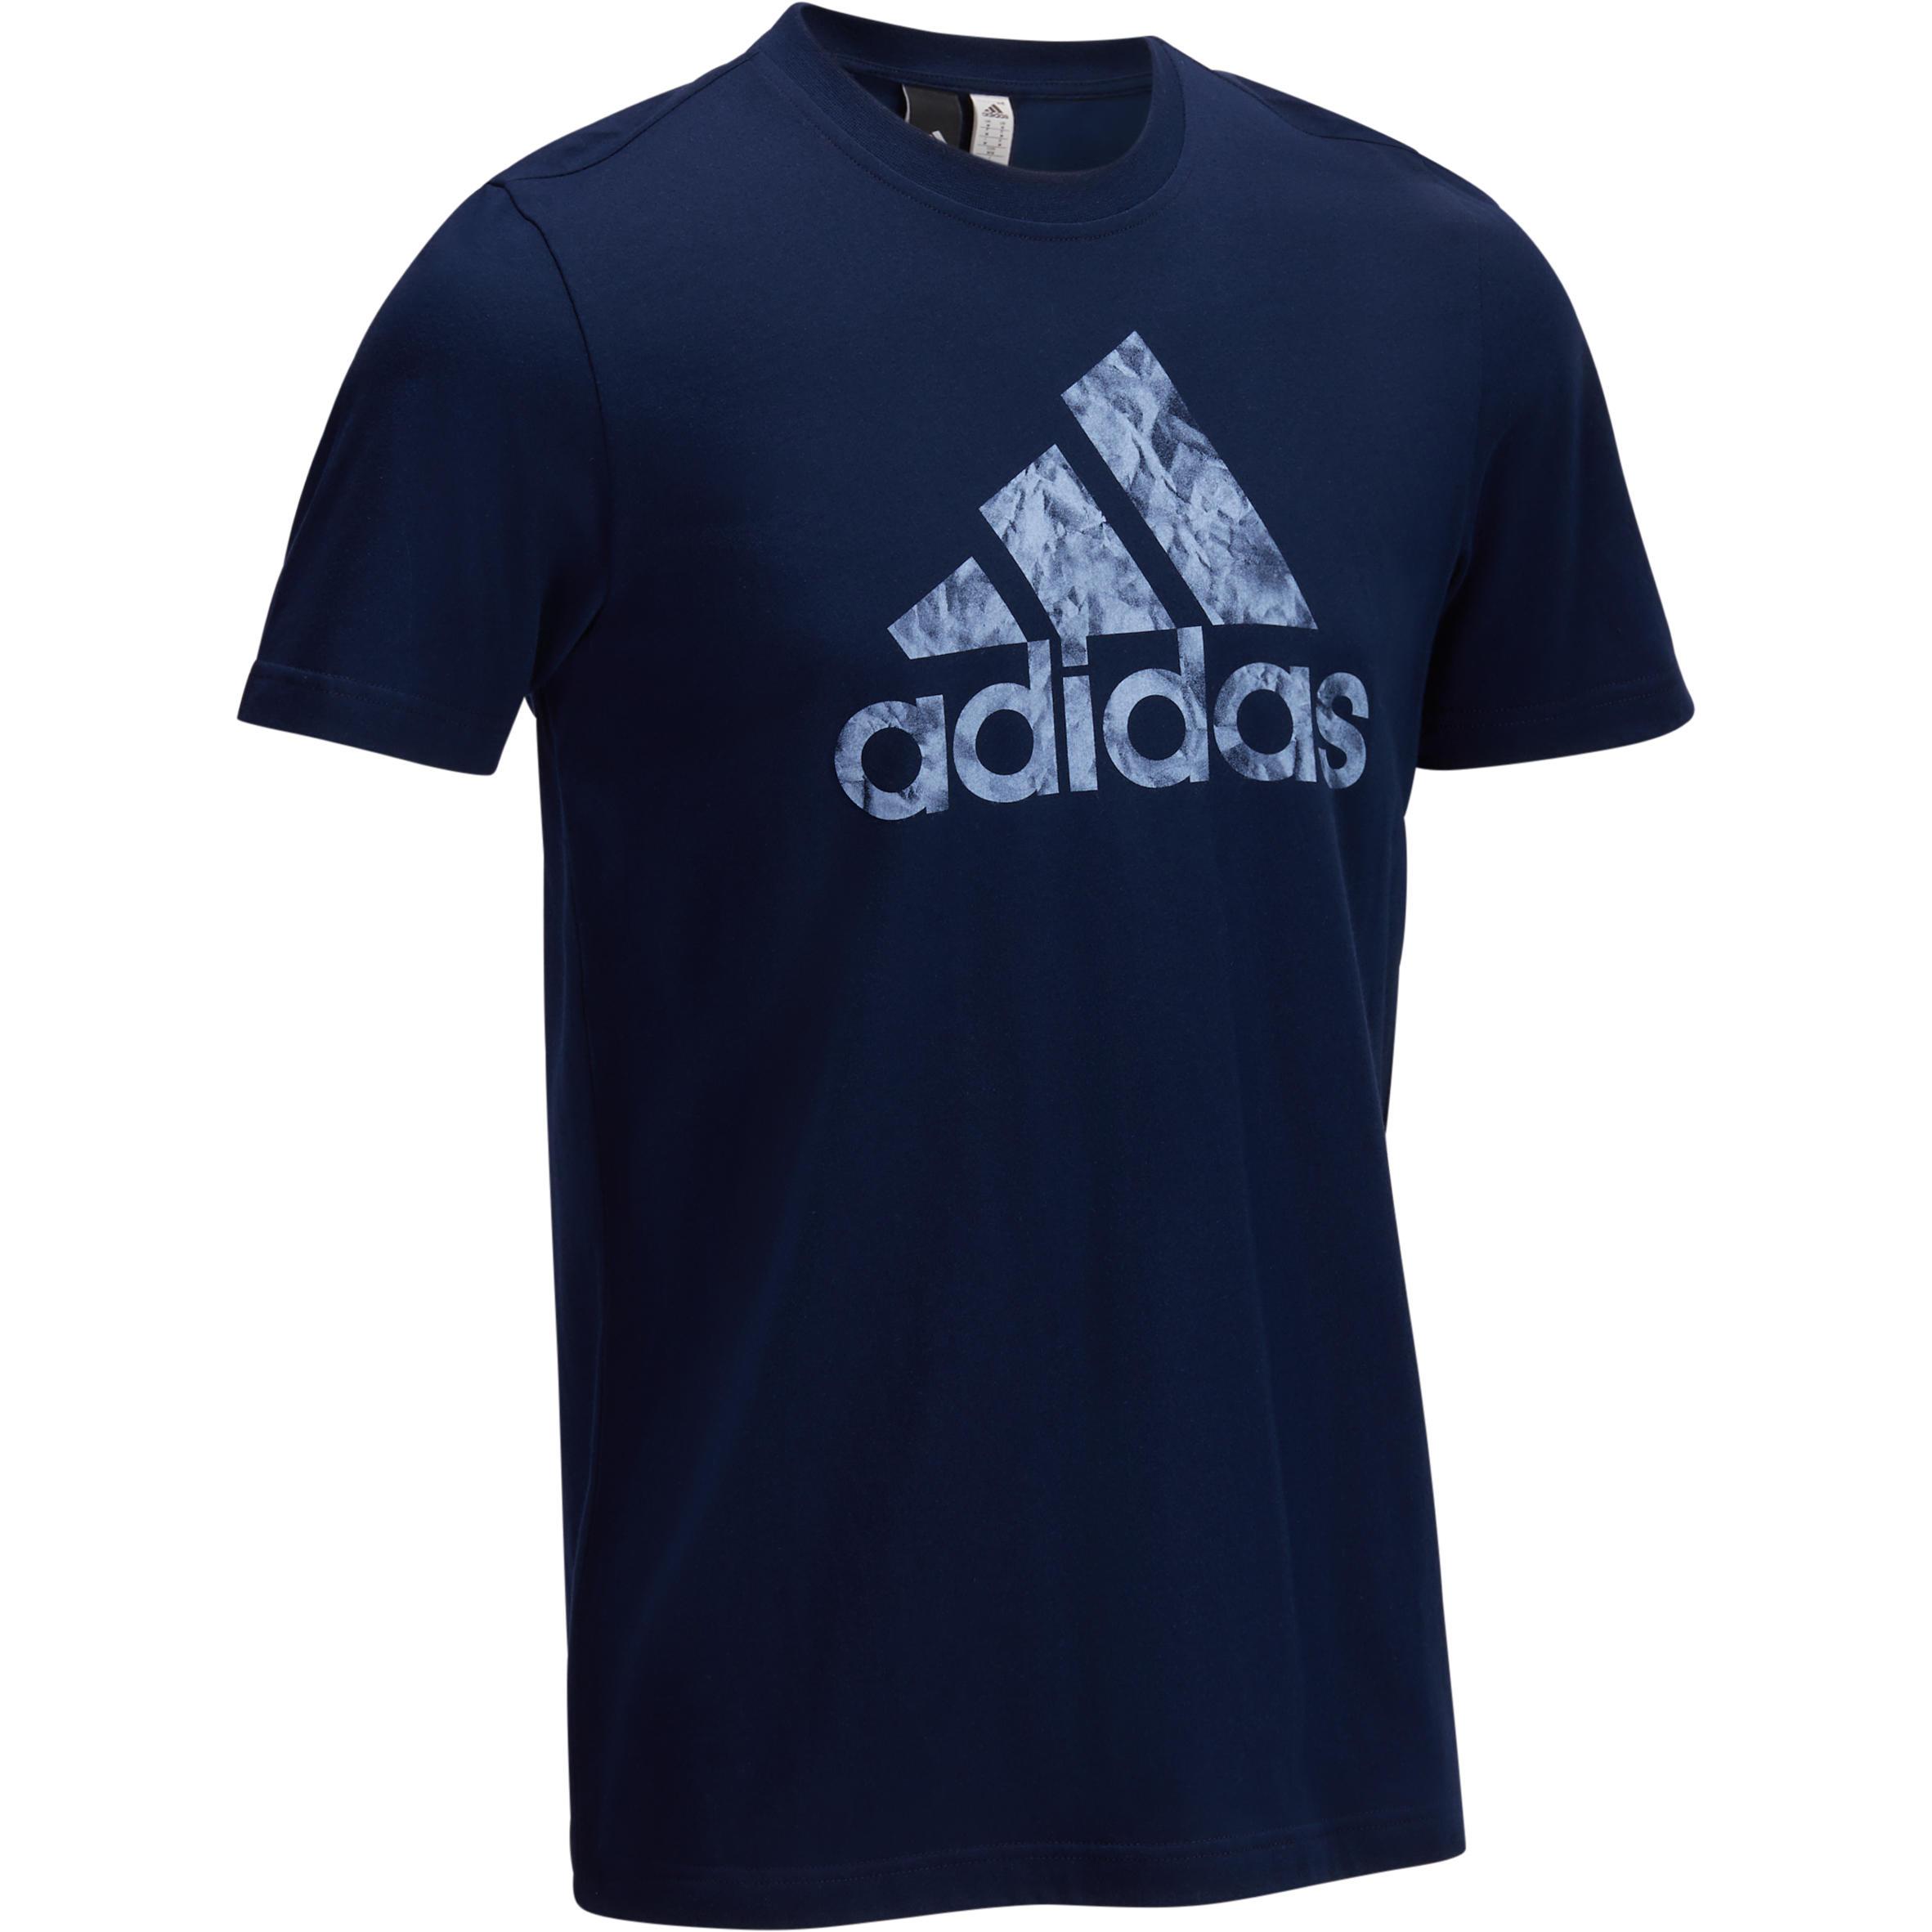 Adidas Heren T-shirt Adidas voor gym en pilates grafisch logo donkerblauw